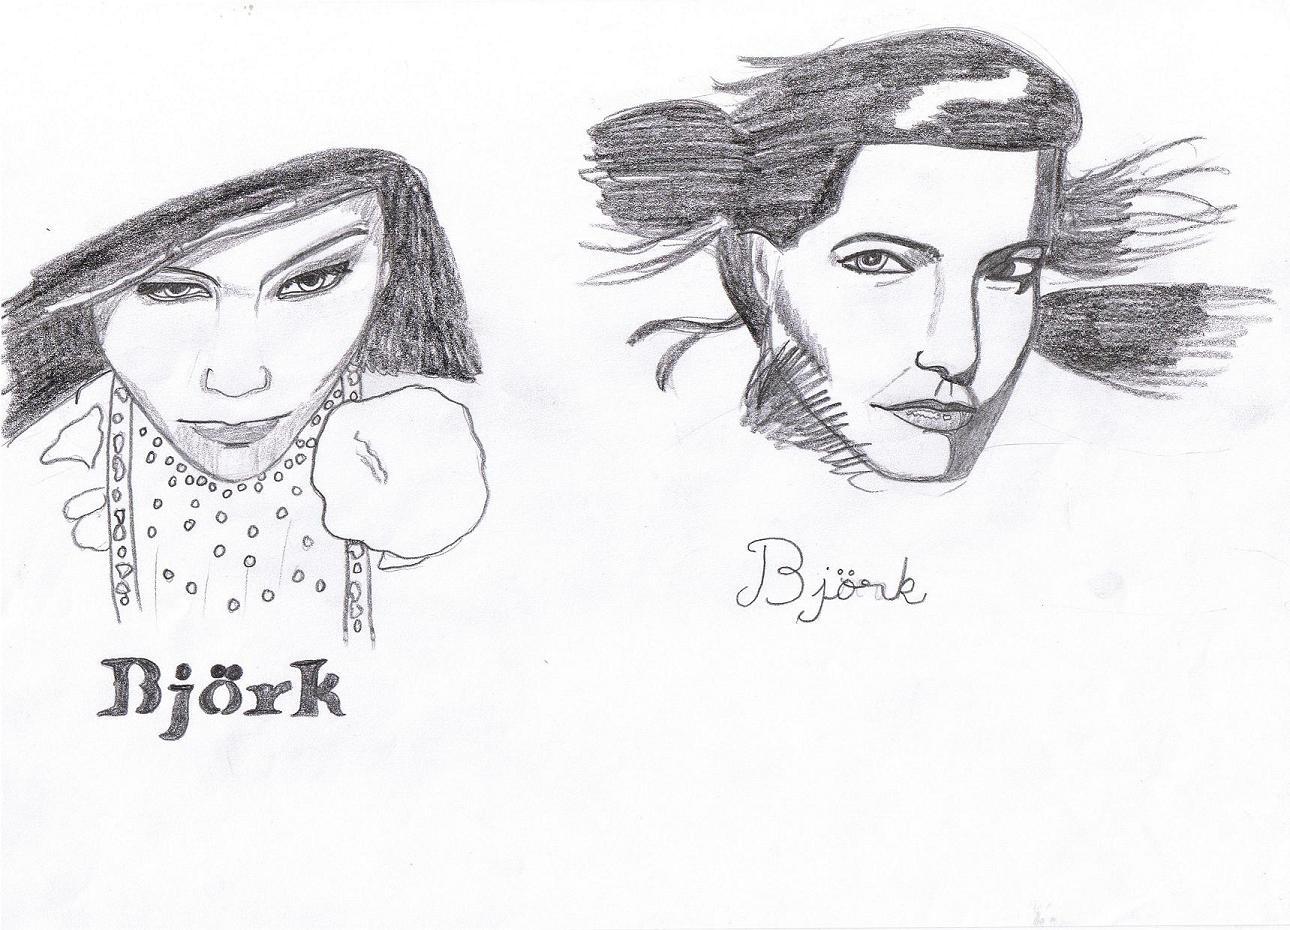 Bjork's faces by Cruxis_Katz